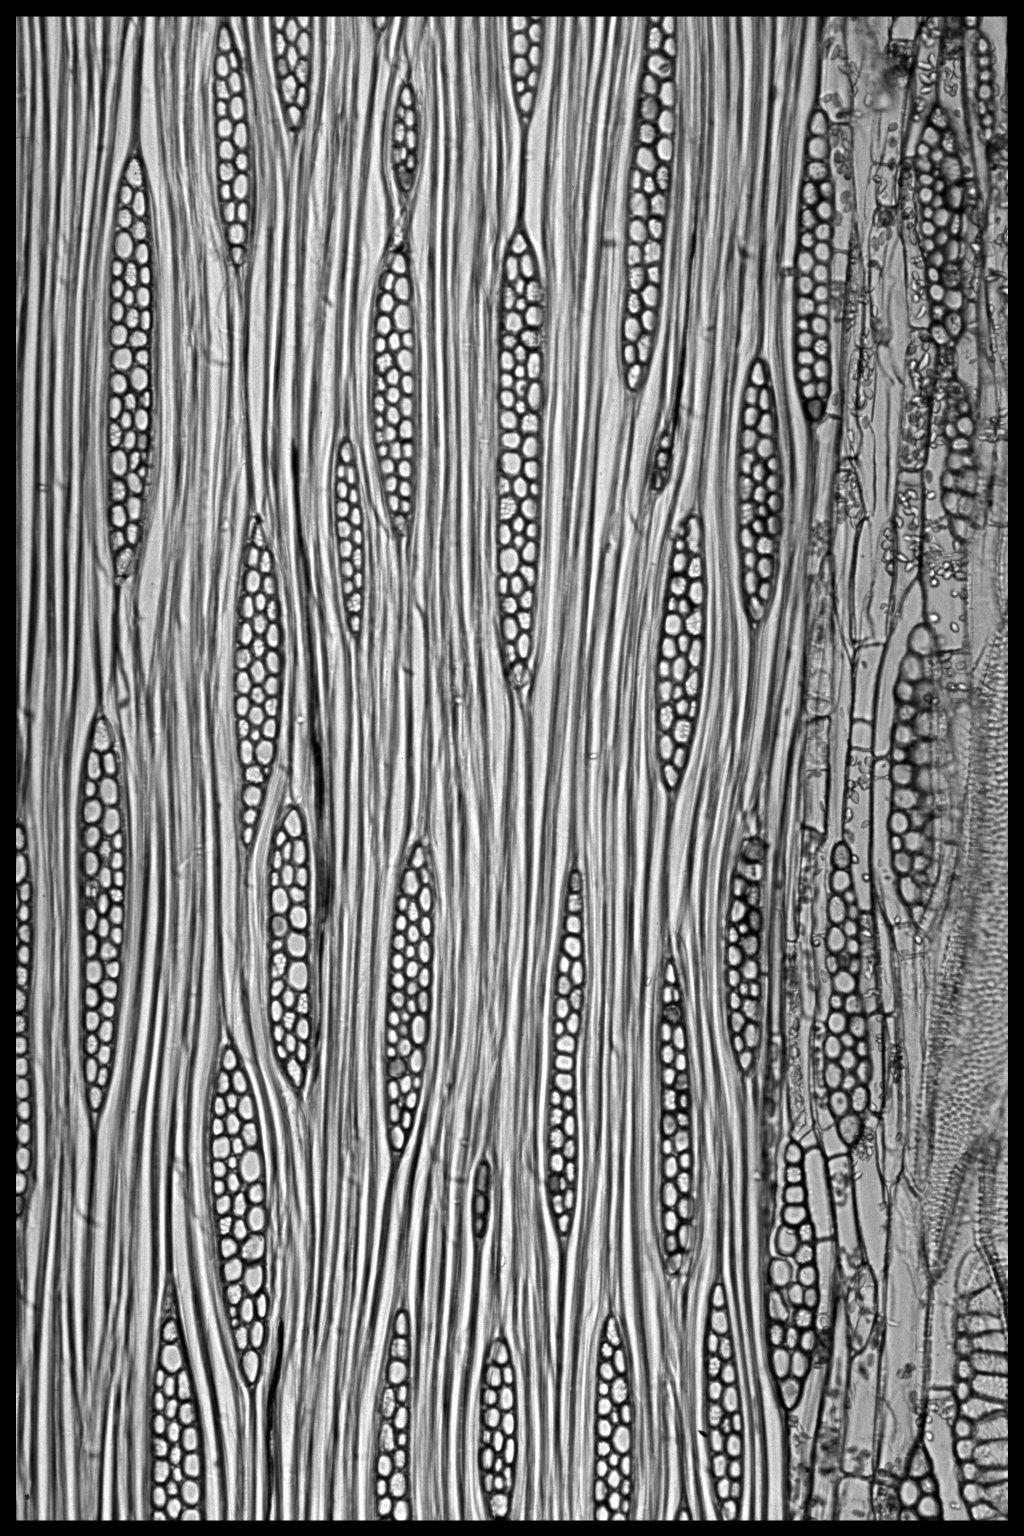 LEGUMINOSAE CAESALPINIOIDEAE Mimosoid Clade Fillaeopsis discophora